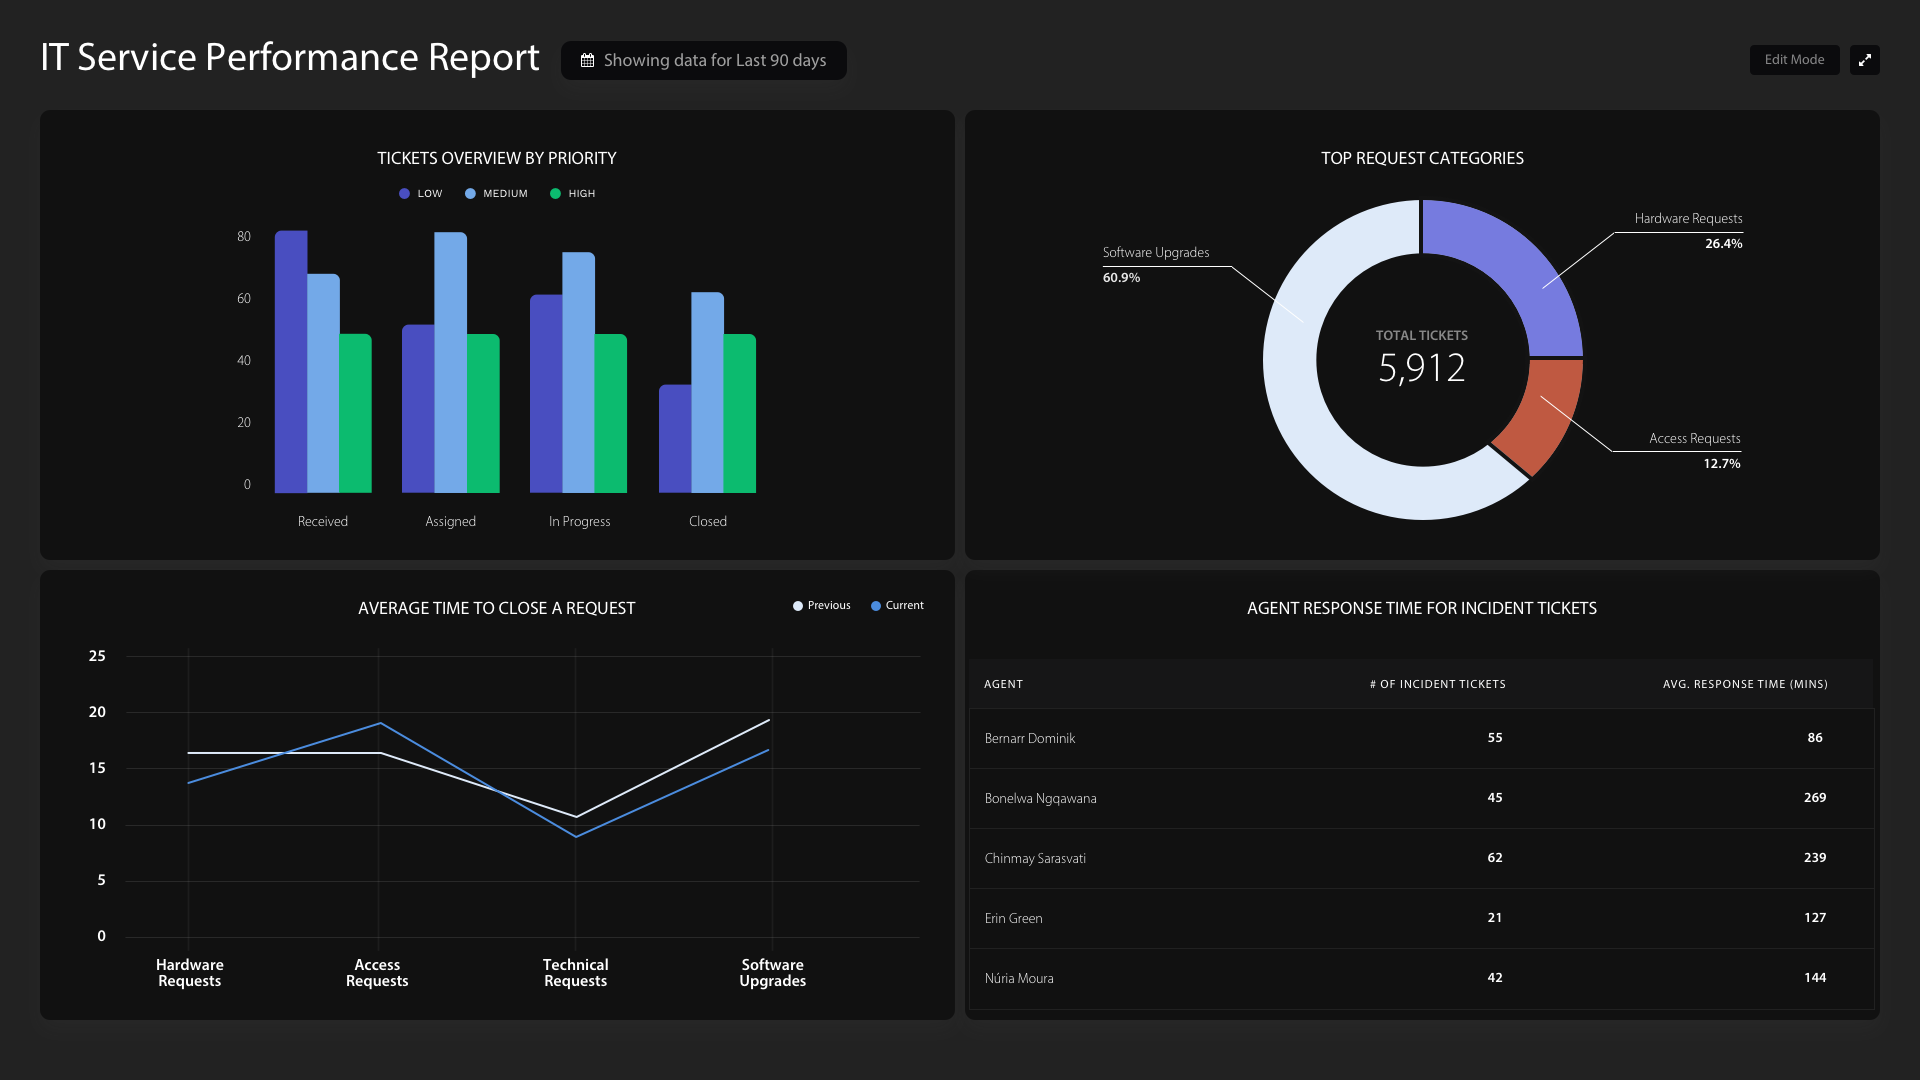 HappyFox BI Software - HappyFox BI customizable dashboards: service performance reports